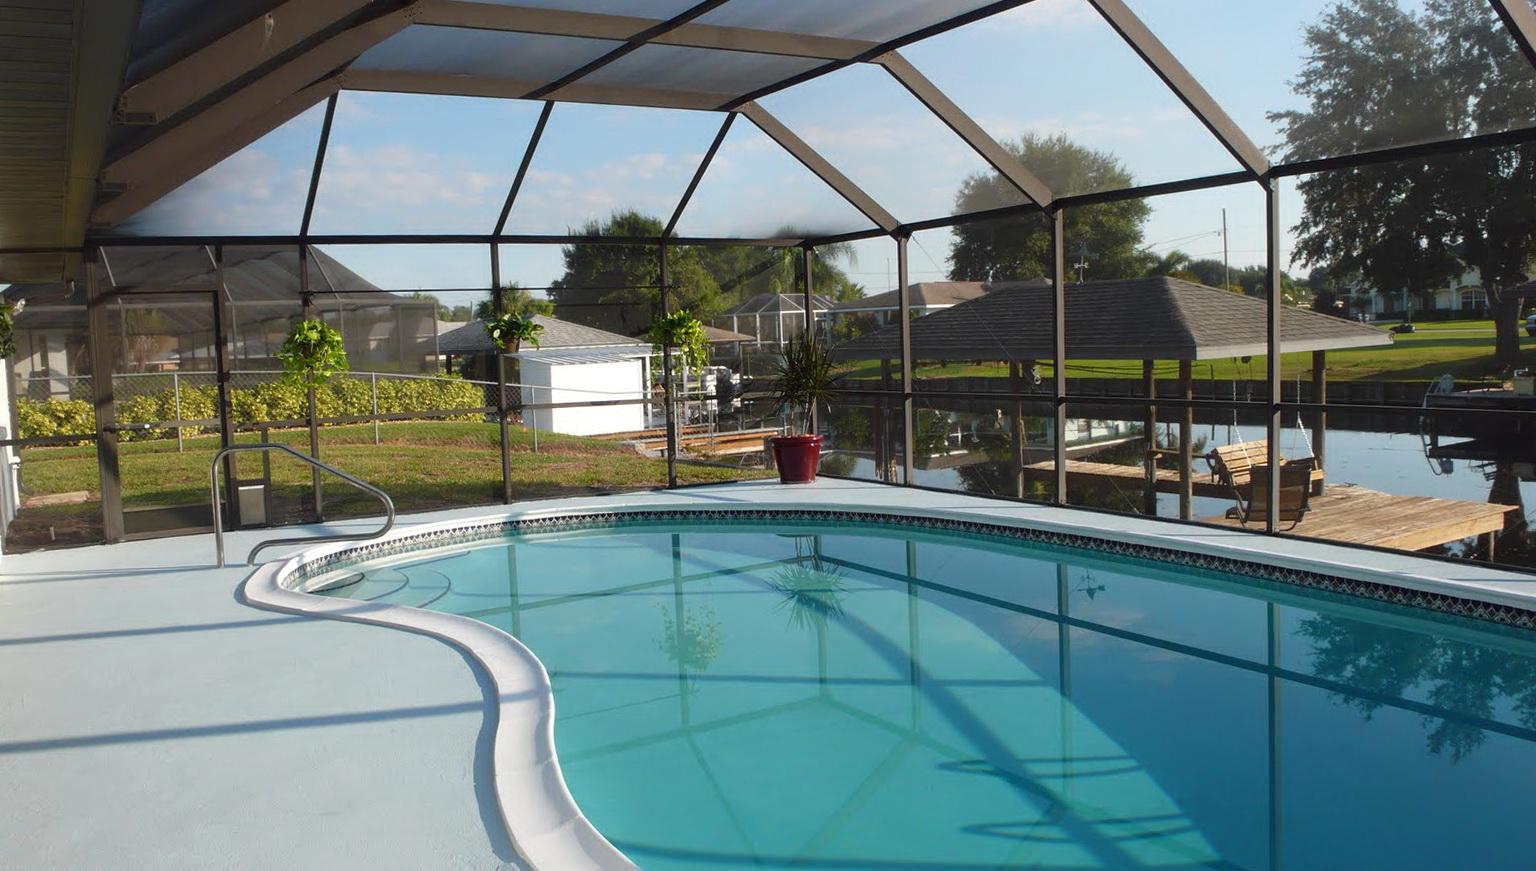 Swimming Pool Deck Paint